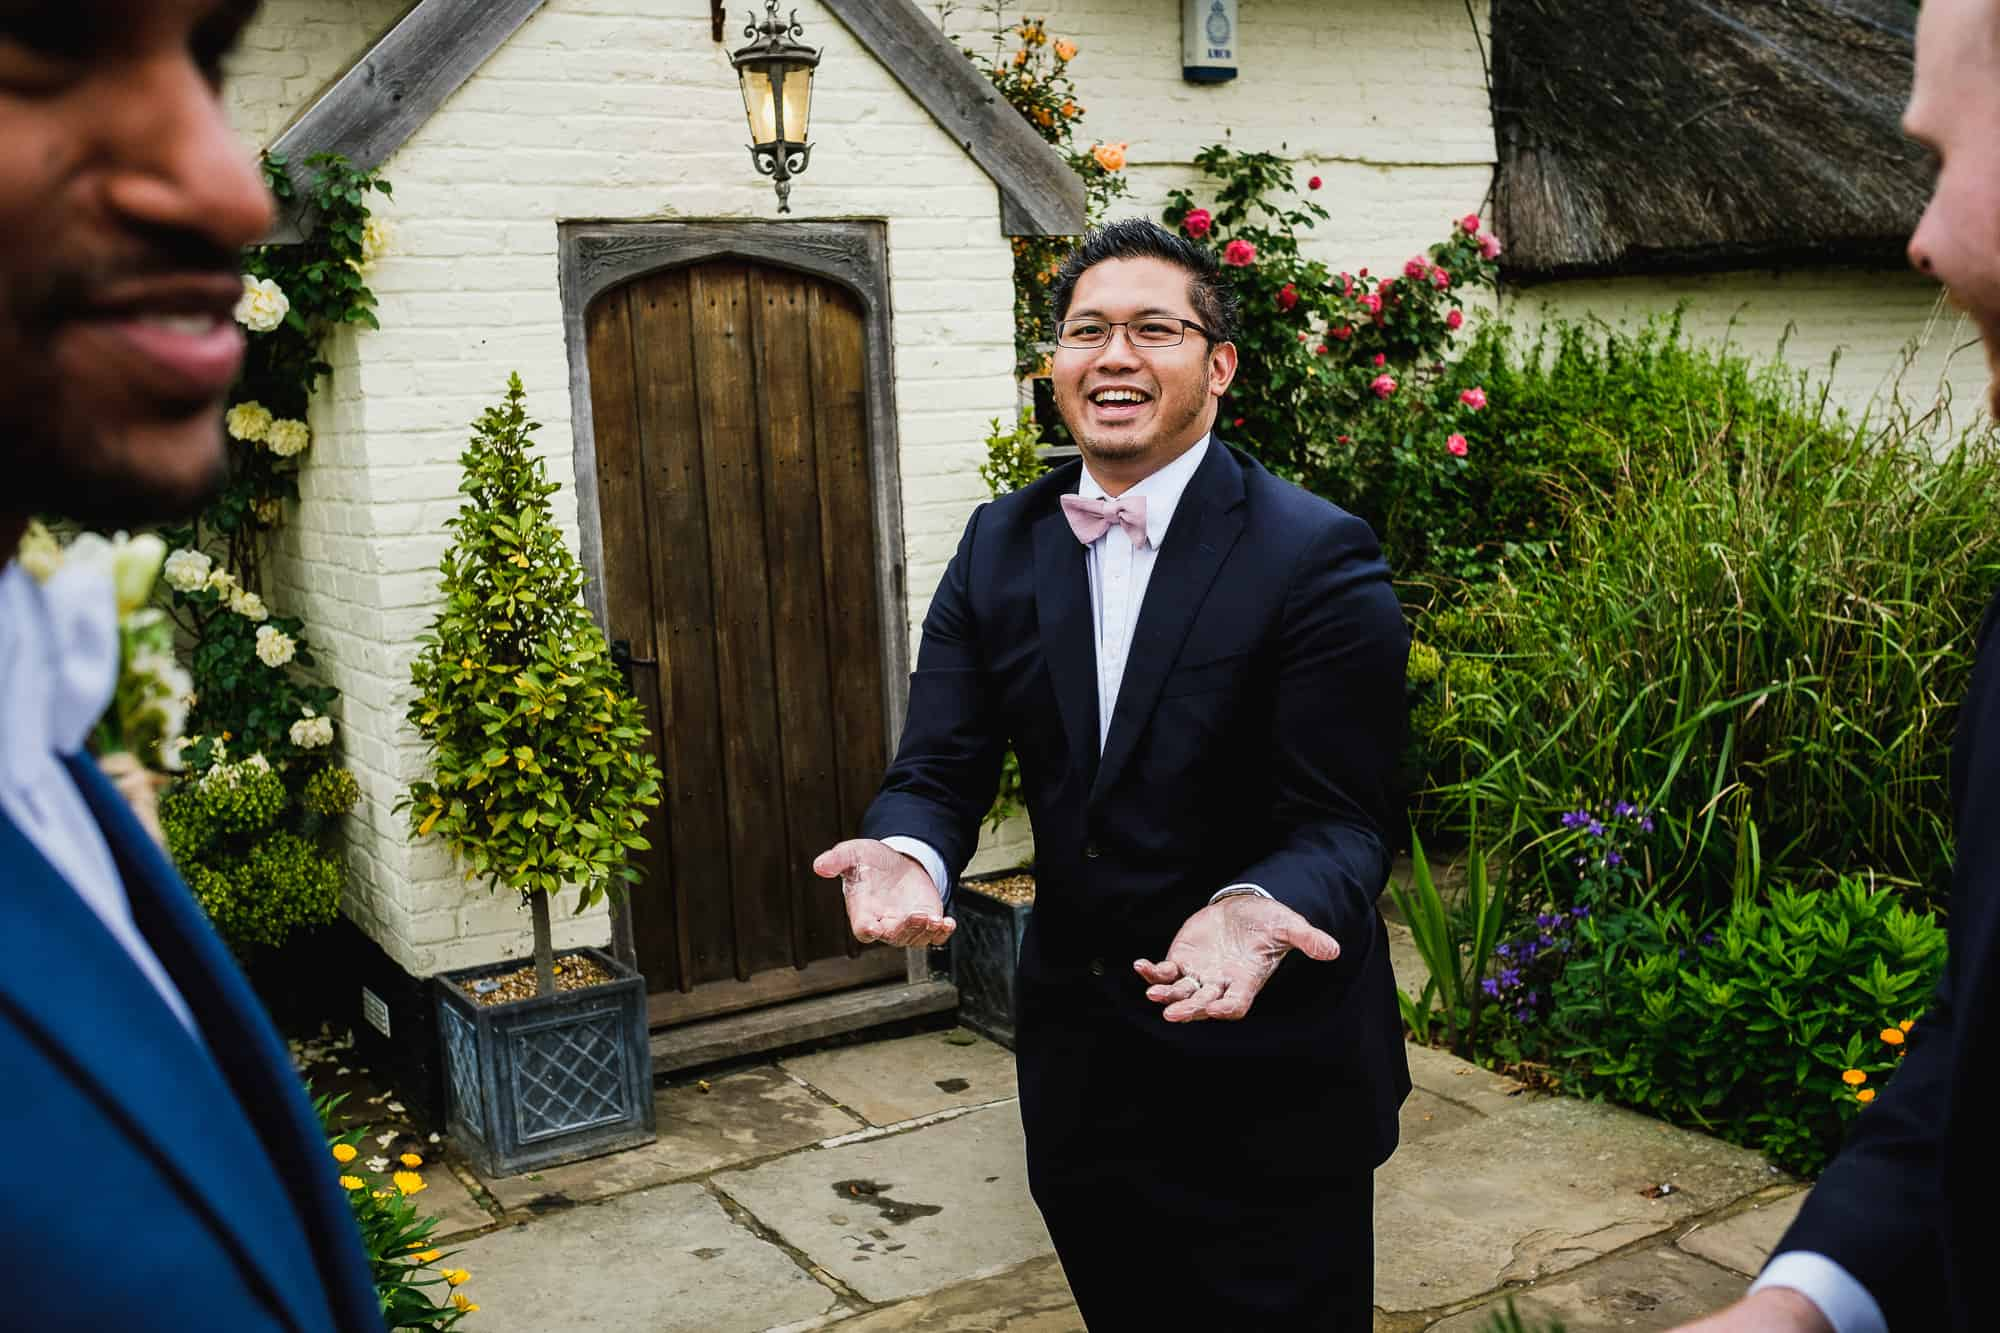 marleybrook-house-wedding-photography-matt-tyler-0014